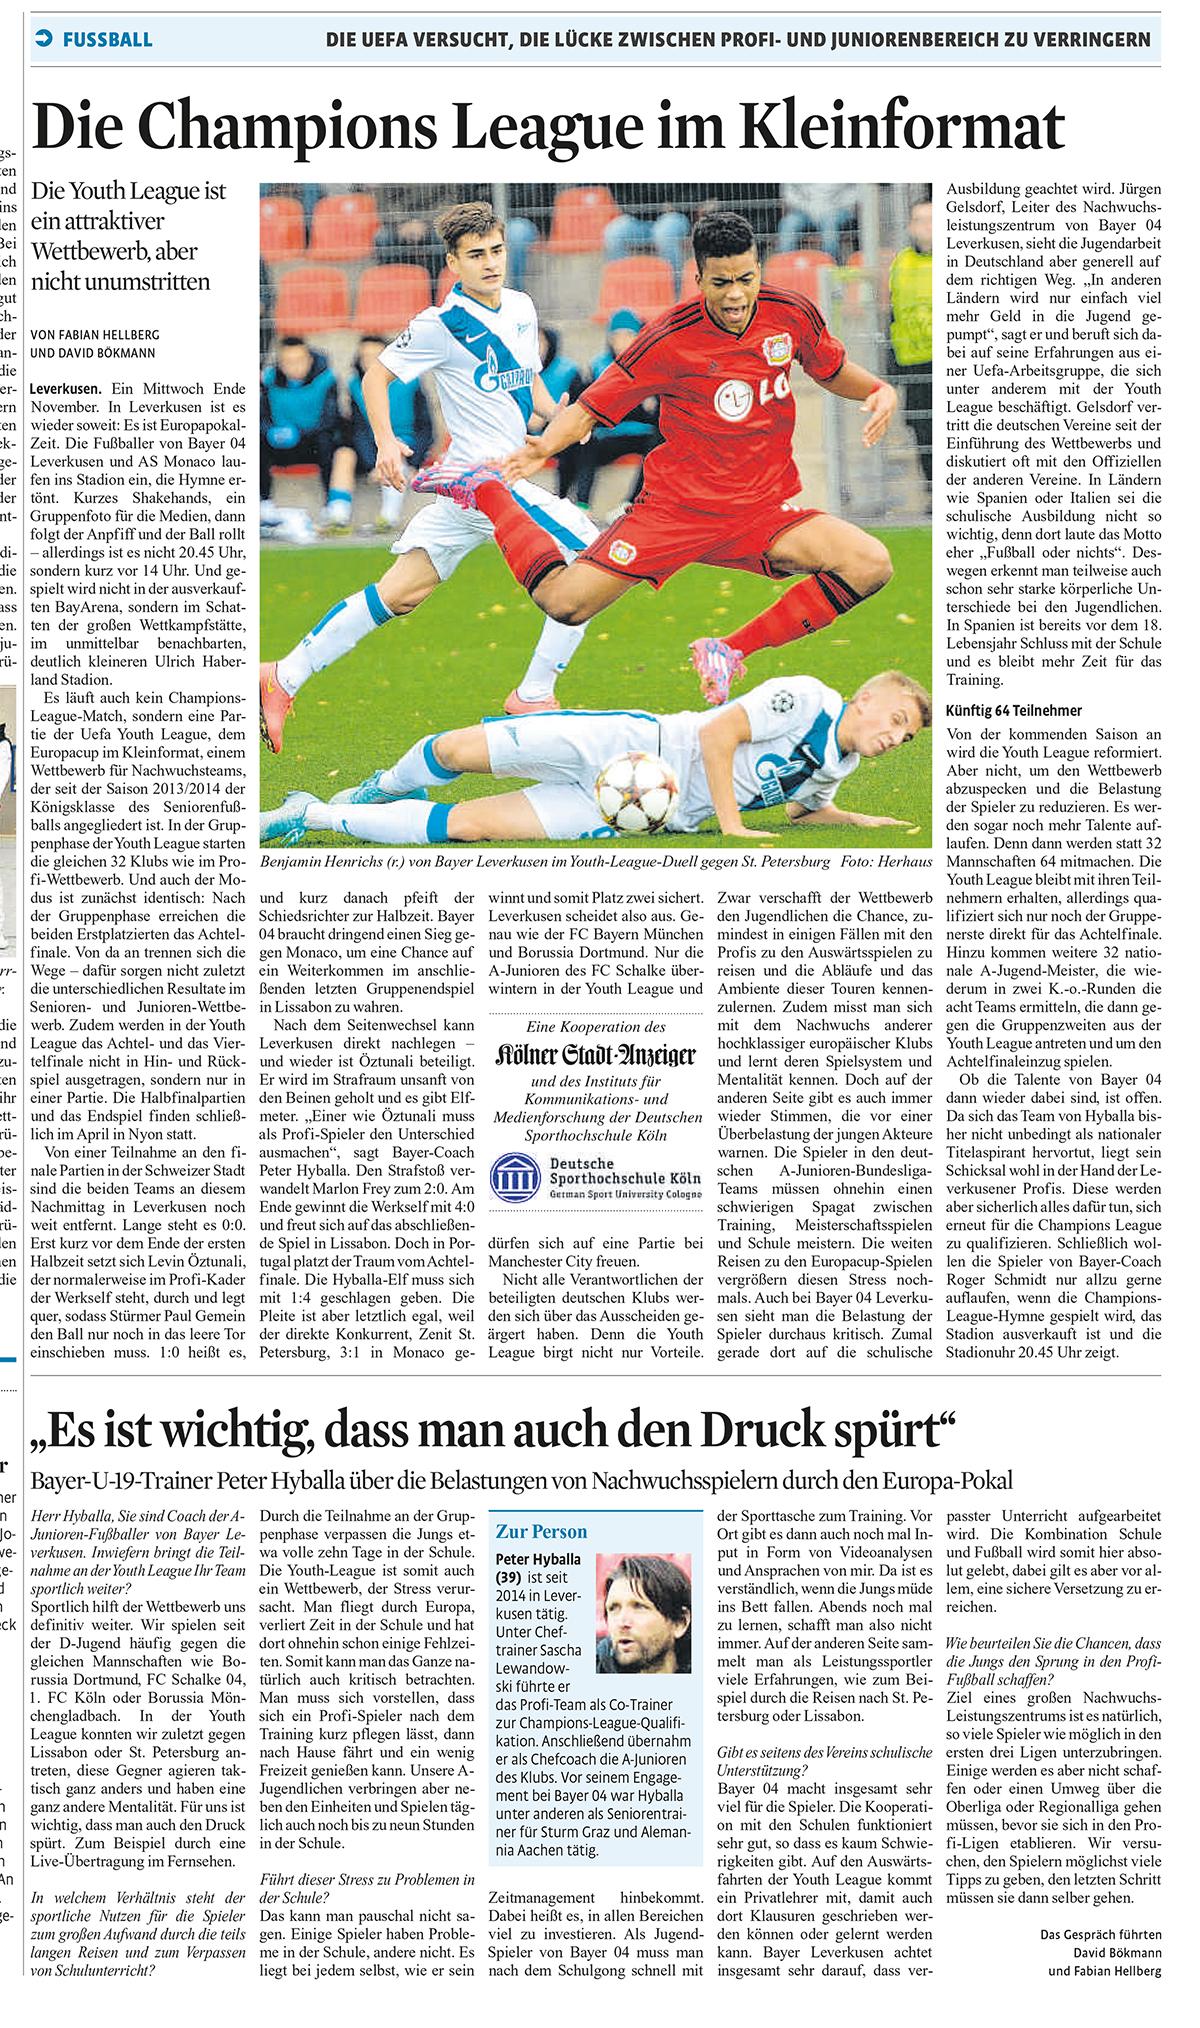 Bericht: Bayer Leverkusen U19 in der Junioren-Champions League